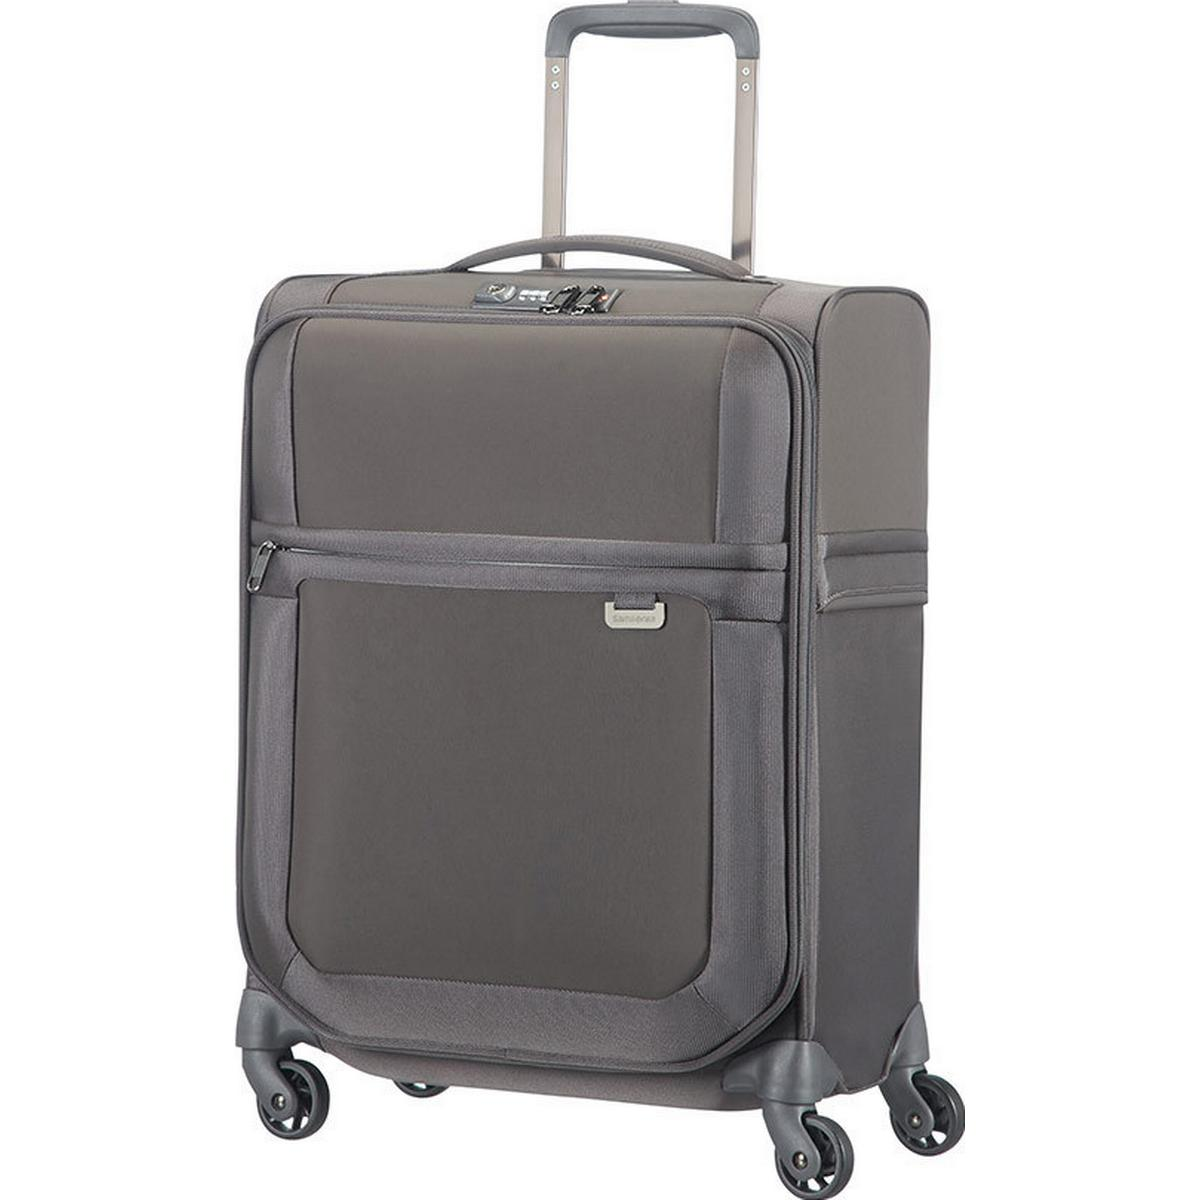 Kabinekuffert (500+ produkter) hos PriceRunner • Se